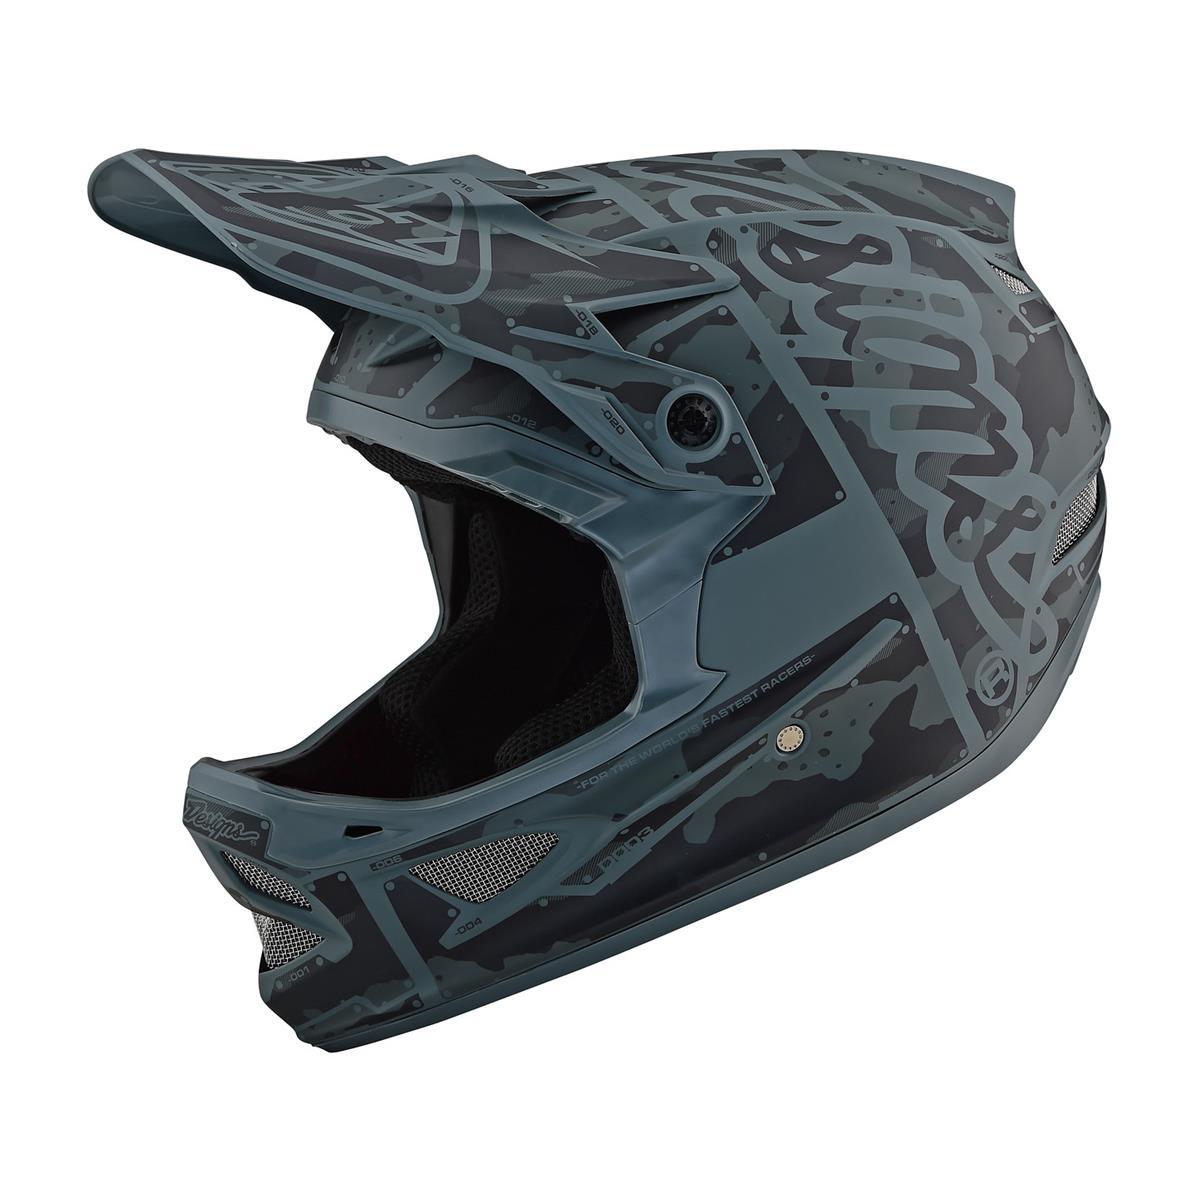 Troy Lee Designs Downhill-MTB-Helm D3 Fiberlite Factory - Camo/Grün